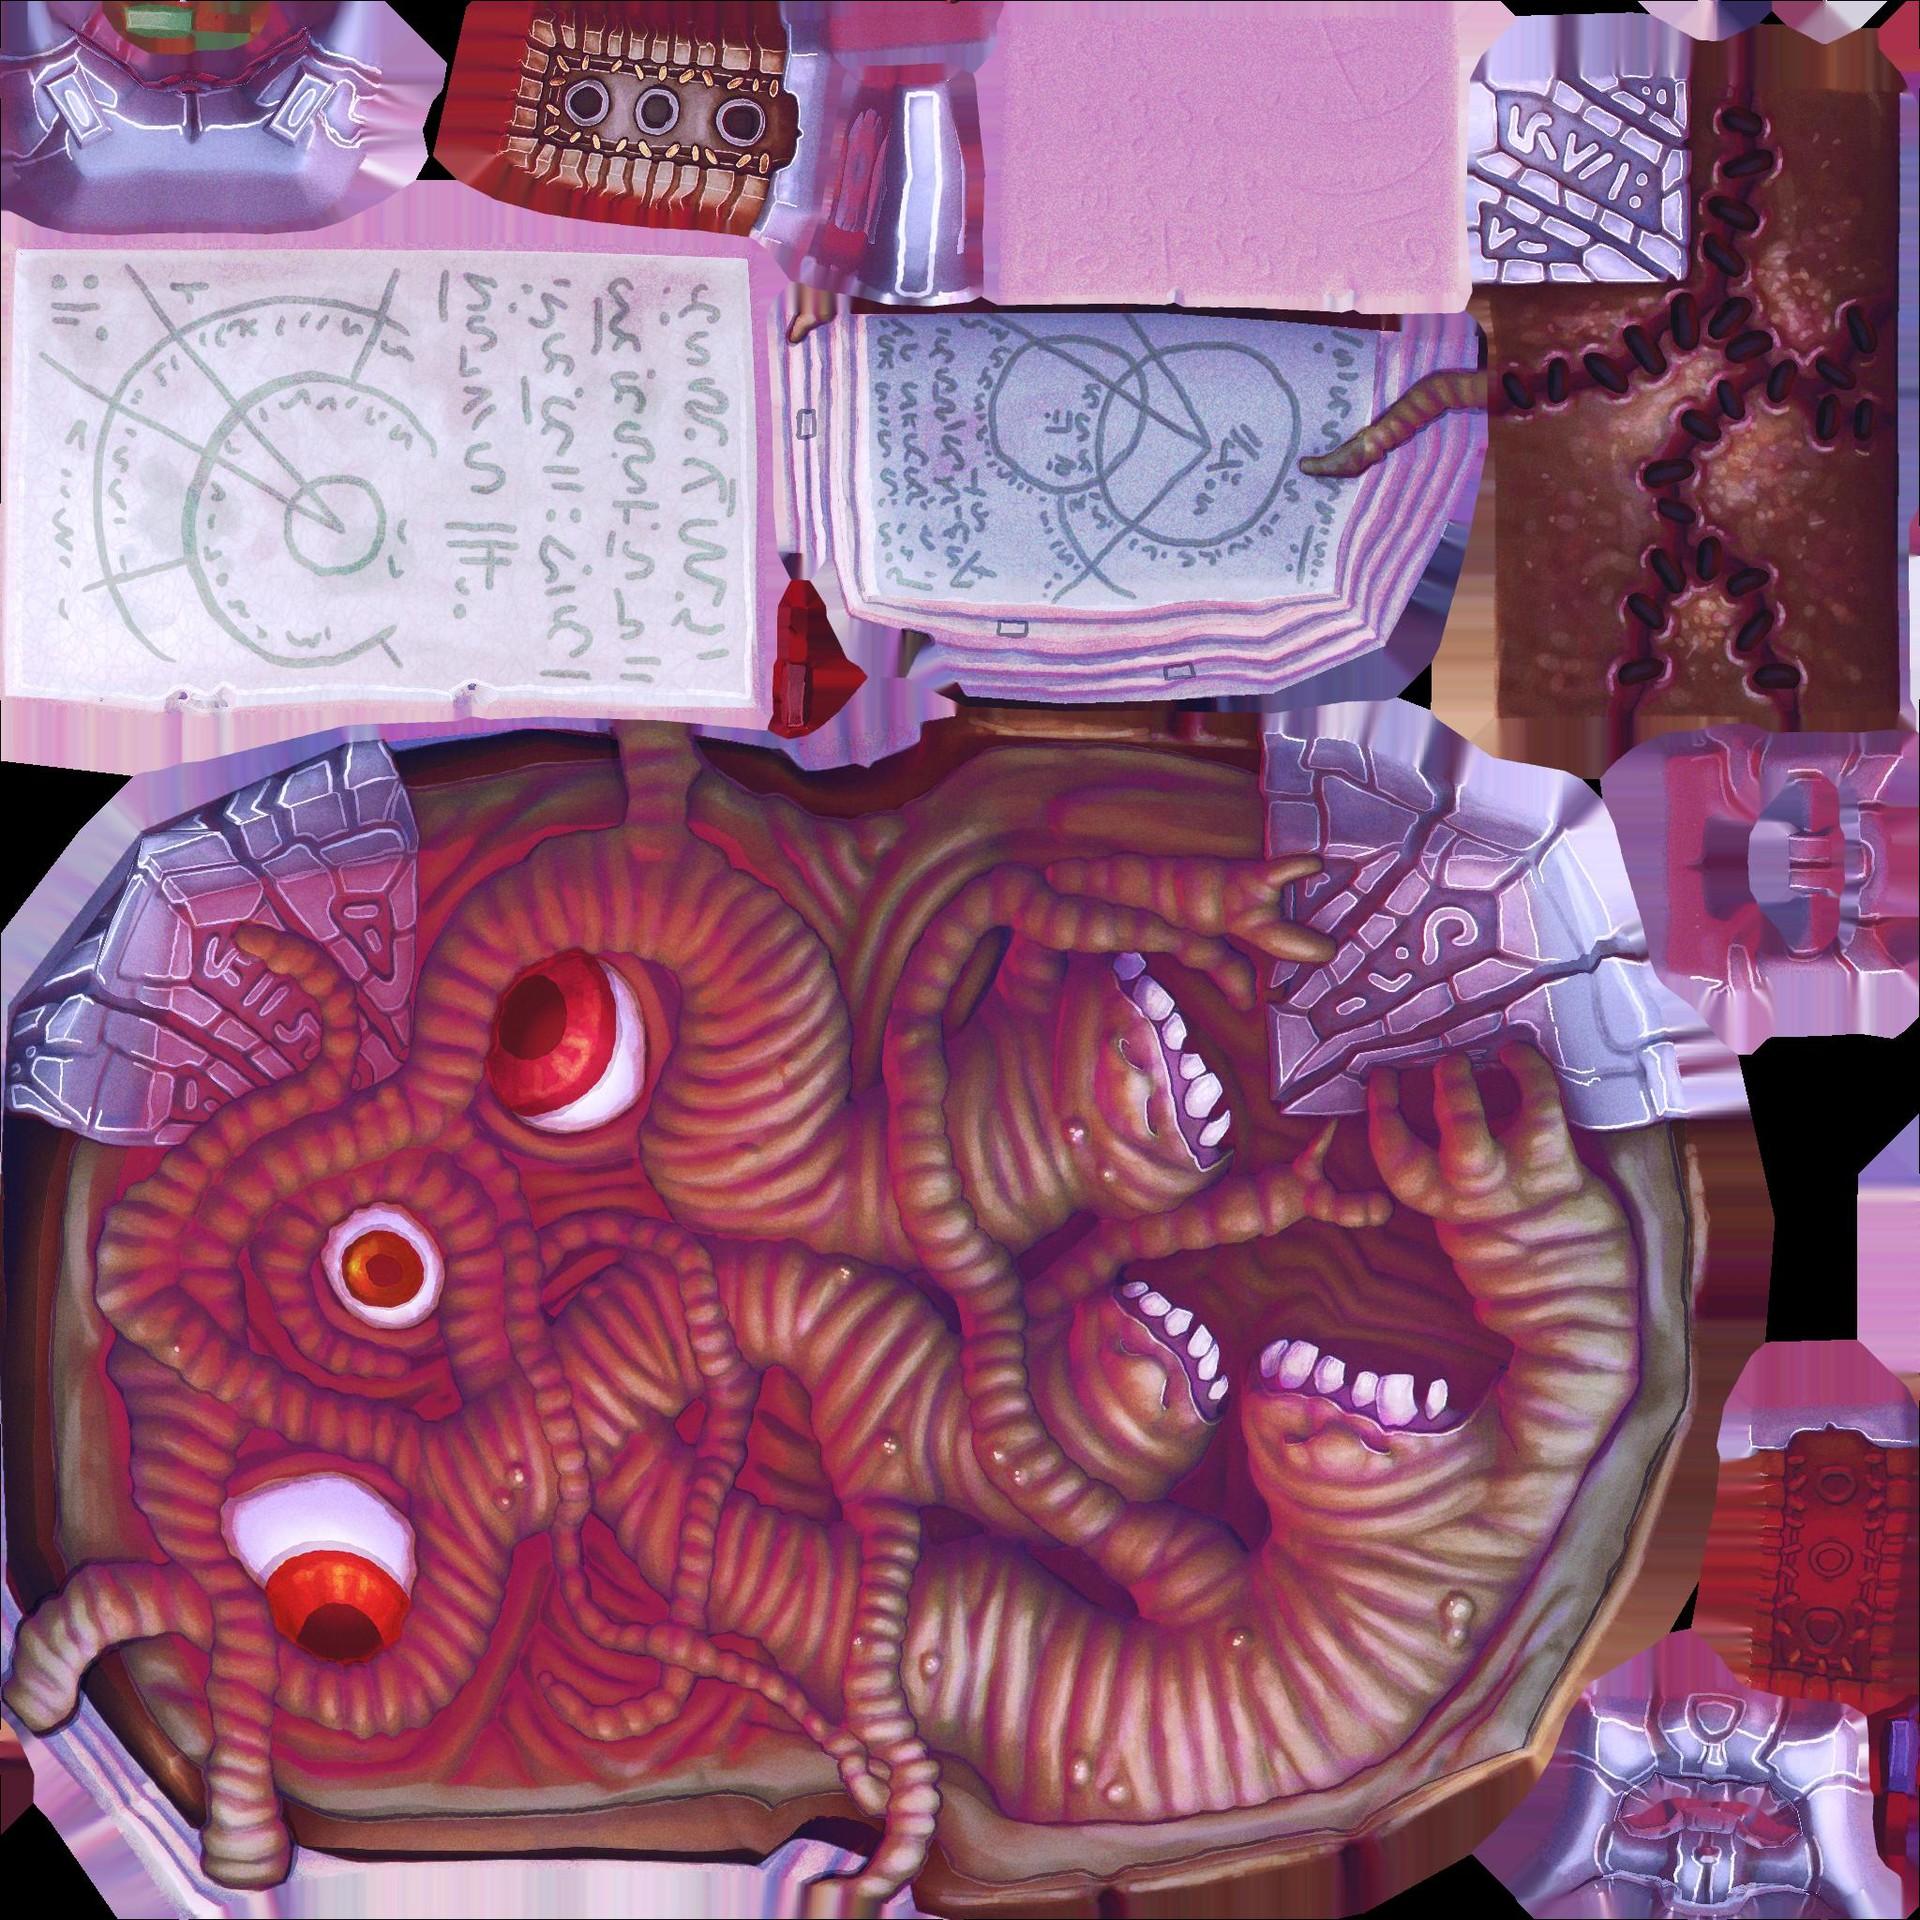 Jose samaniego textura final